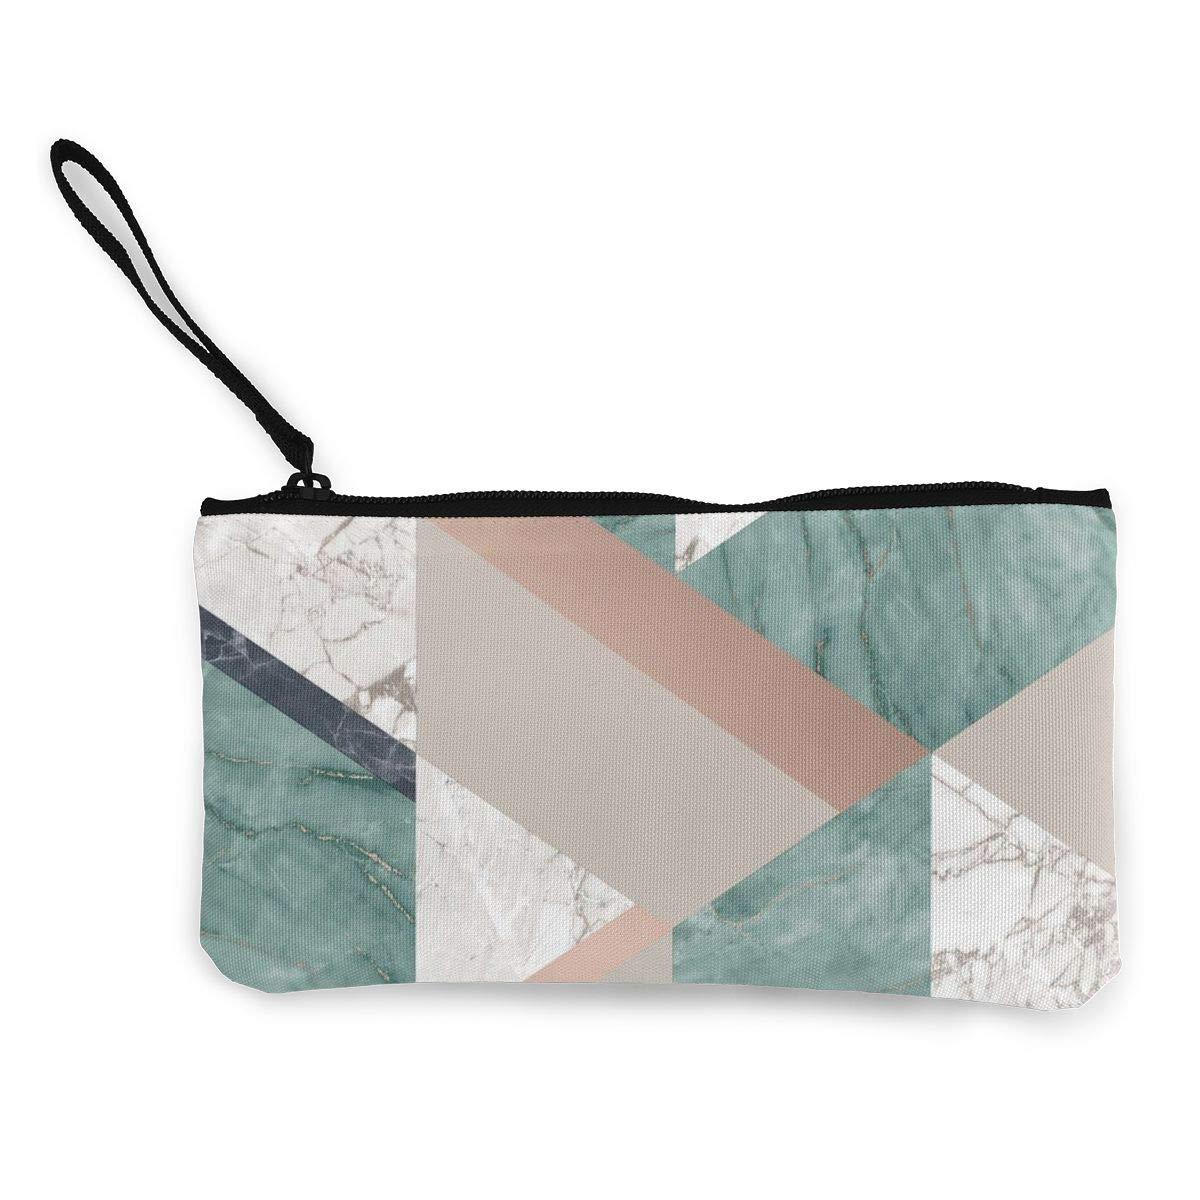 Canvas Cash Coin Purse,Green Tile Print Make Up Bag Zipper Small Purse Wallets